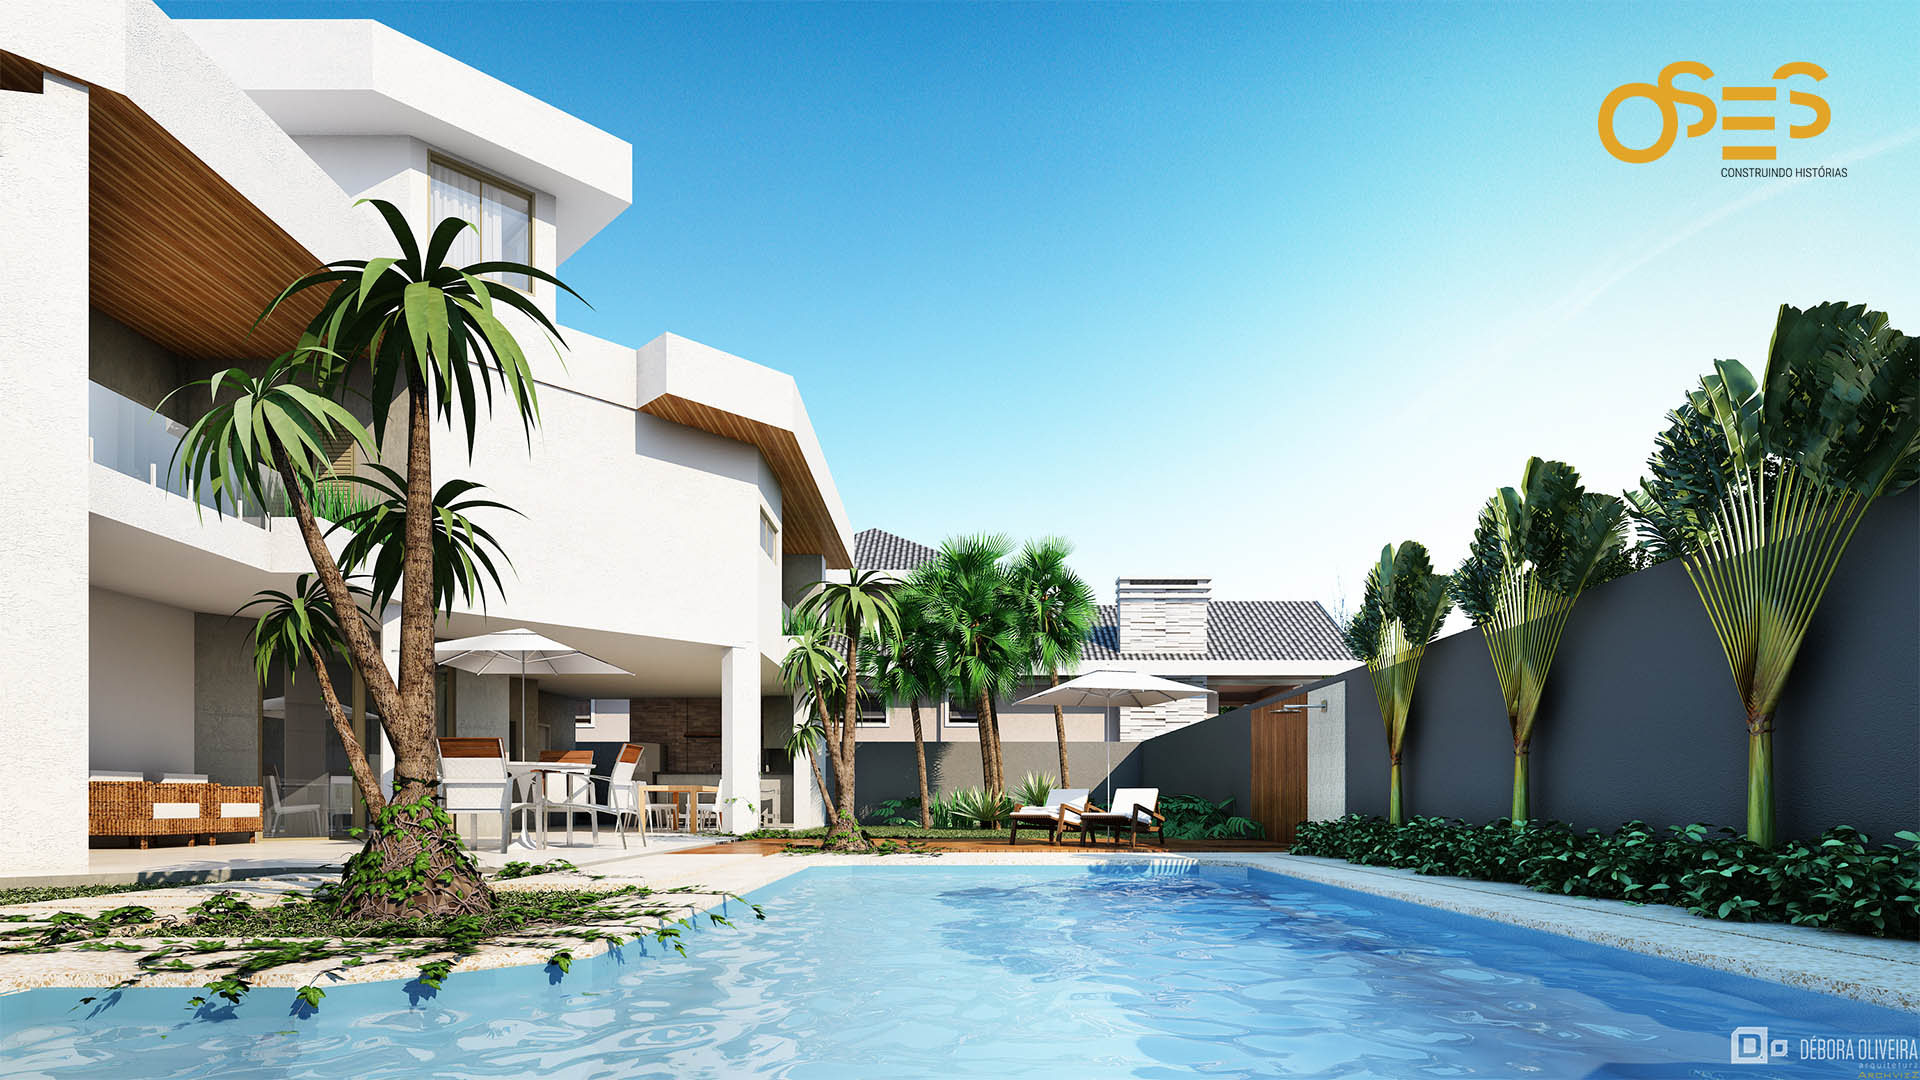 oses-construtora-casa-angular (3)